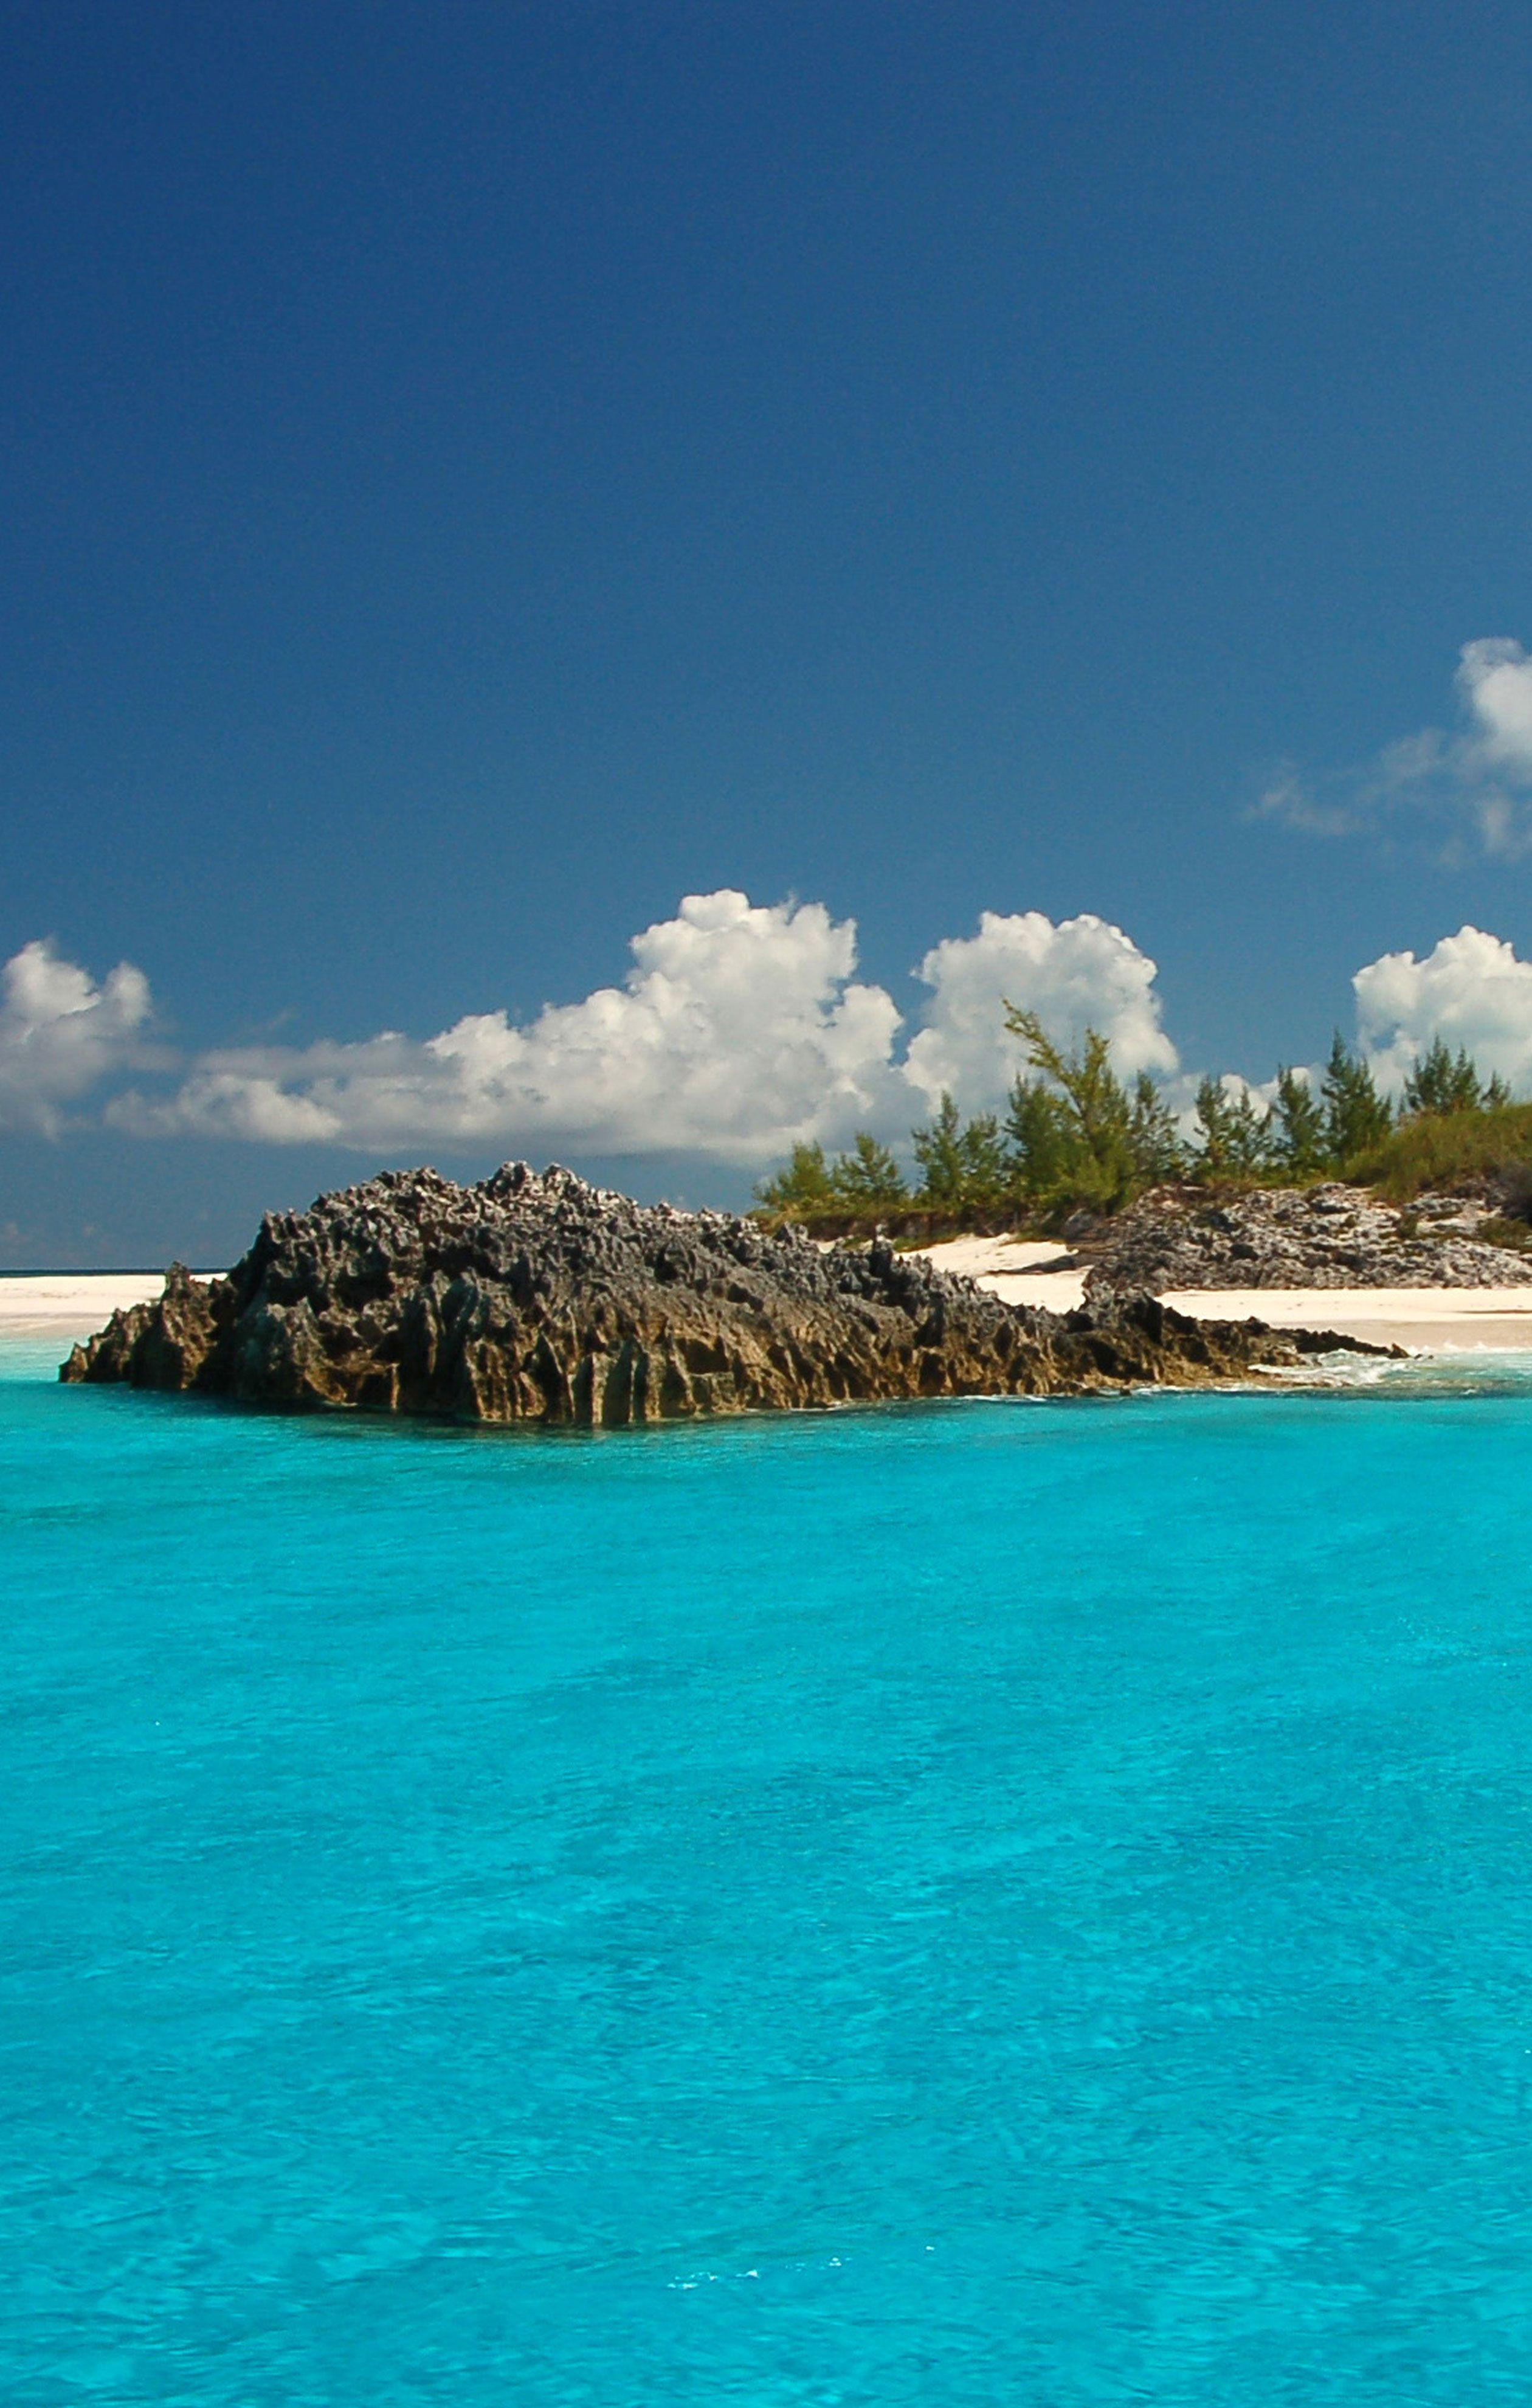 2Night Bahamas Cruise for Two from Bahamas Paradise